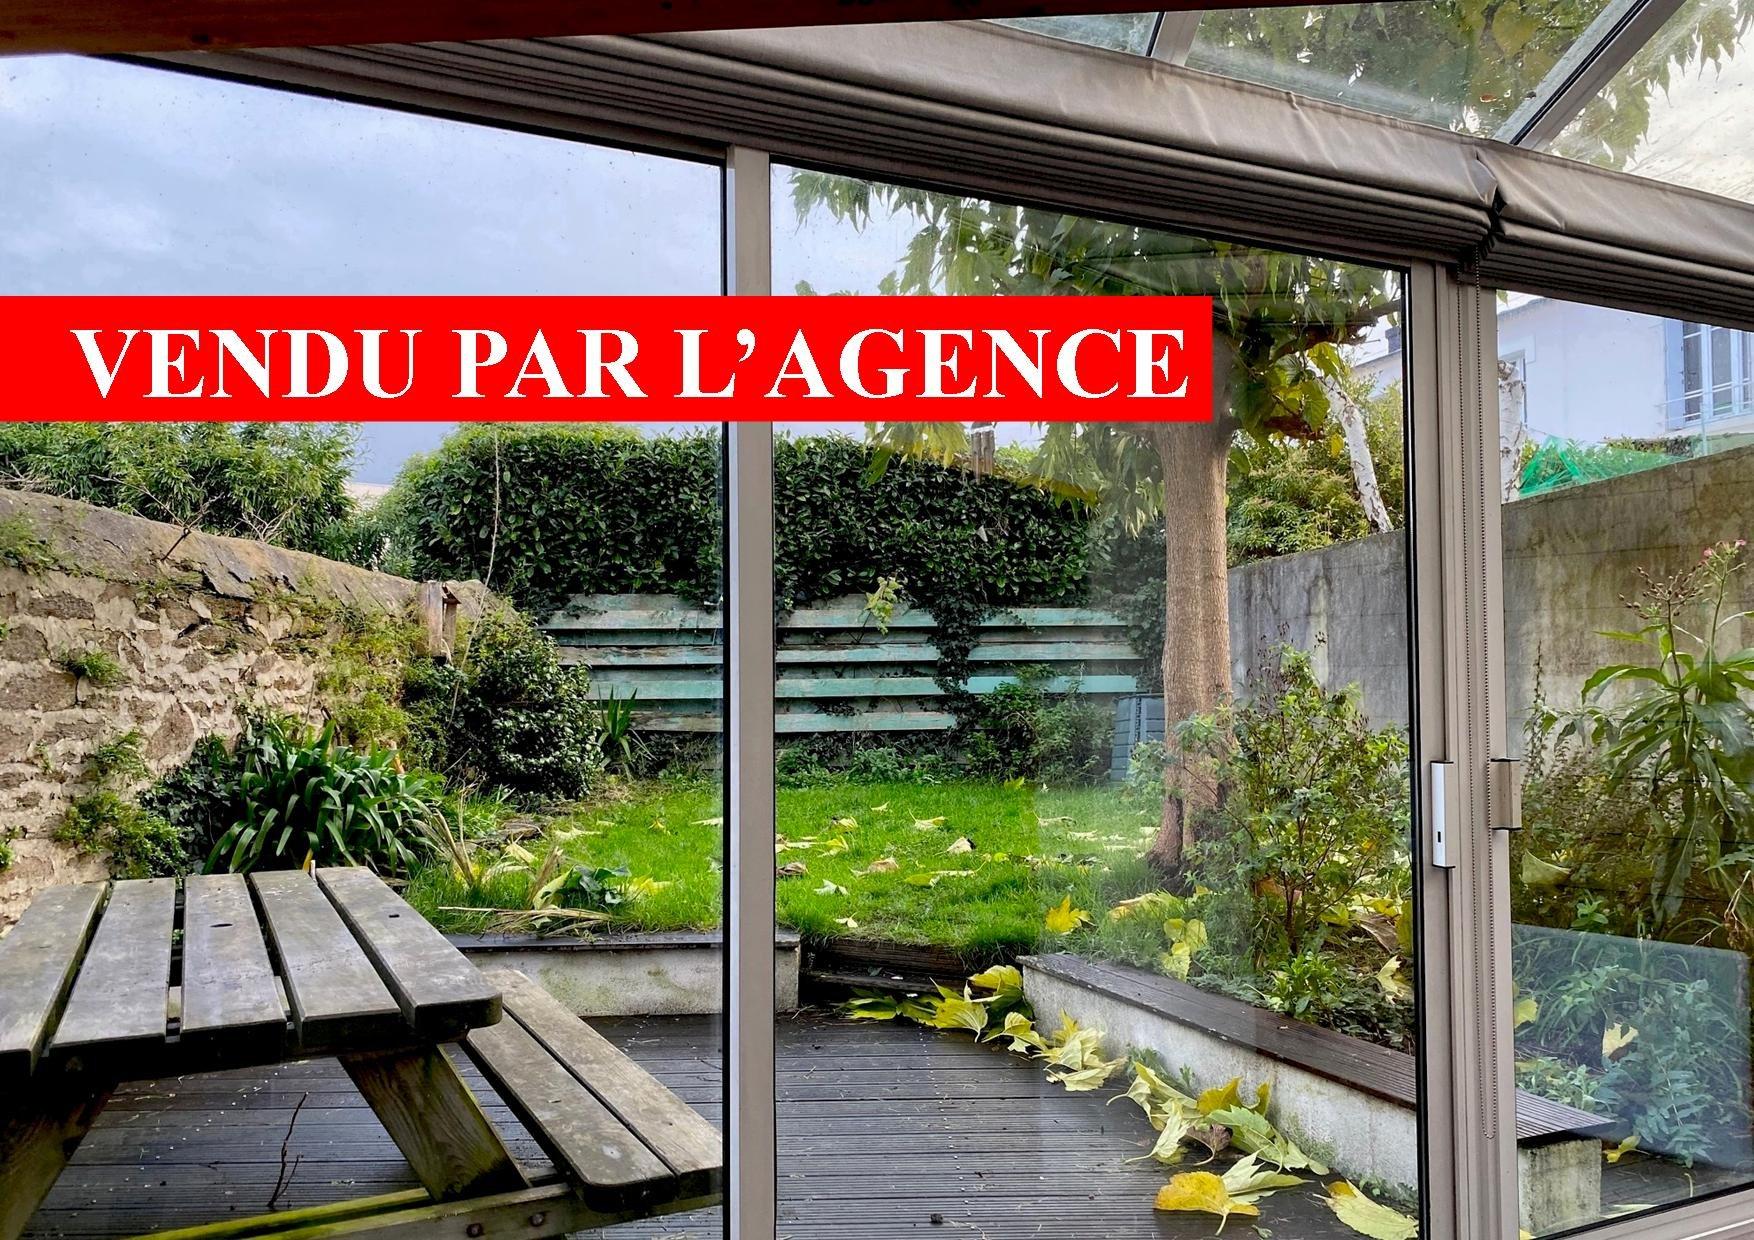 LANREDEC  prox. centre ville volume 130 m2 4 chambres garage